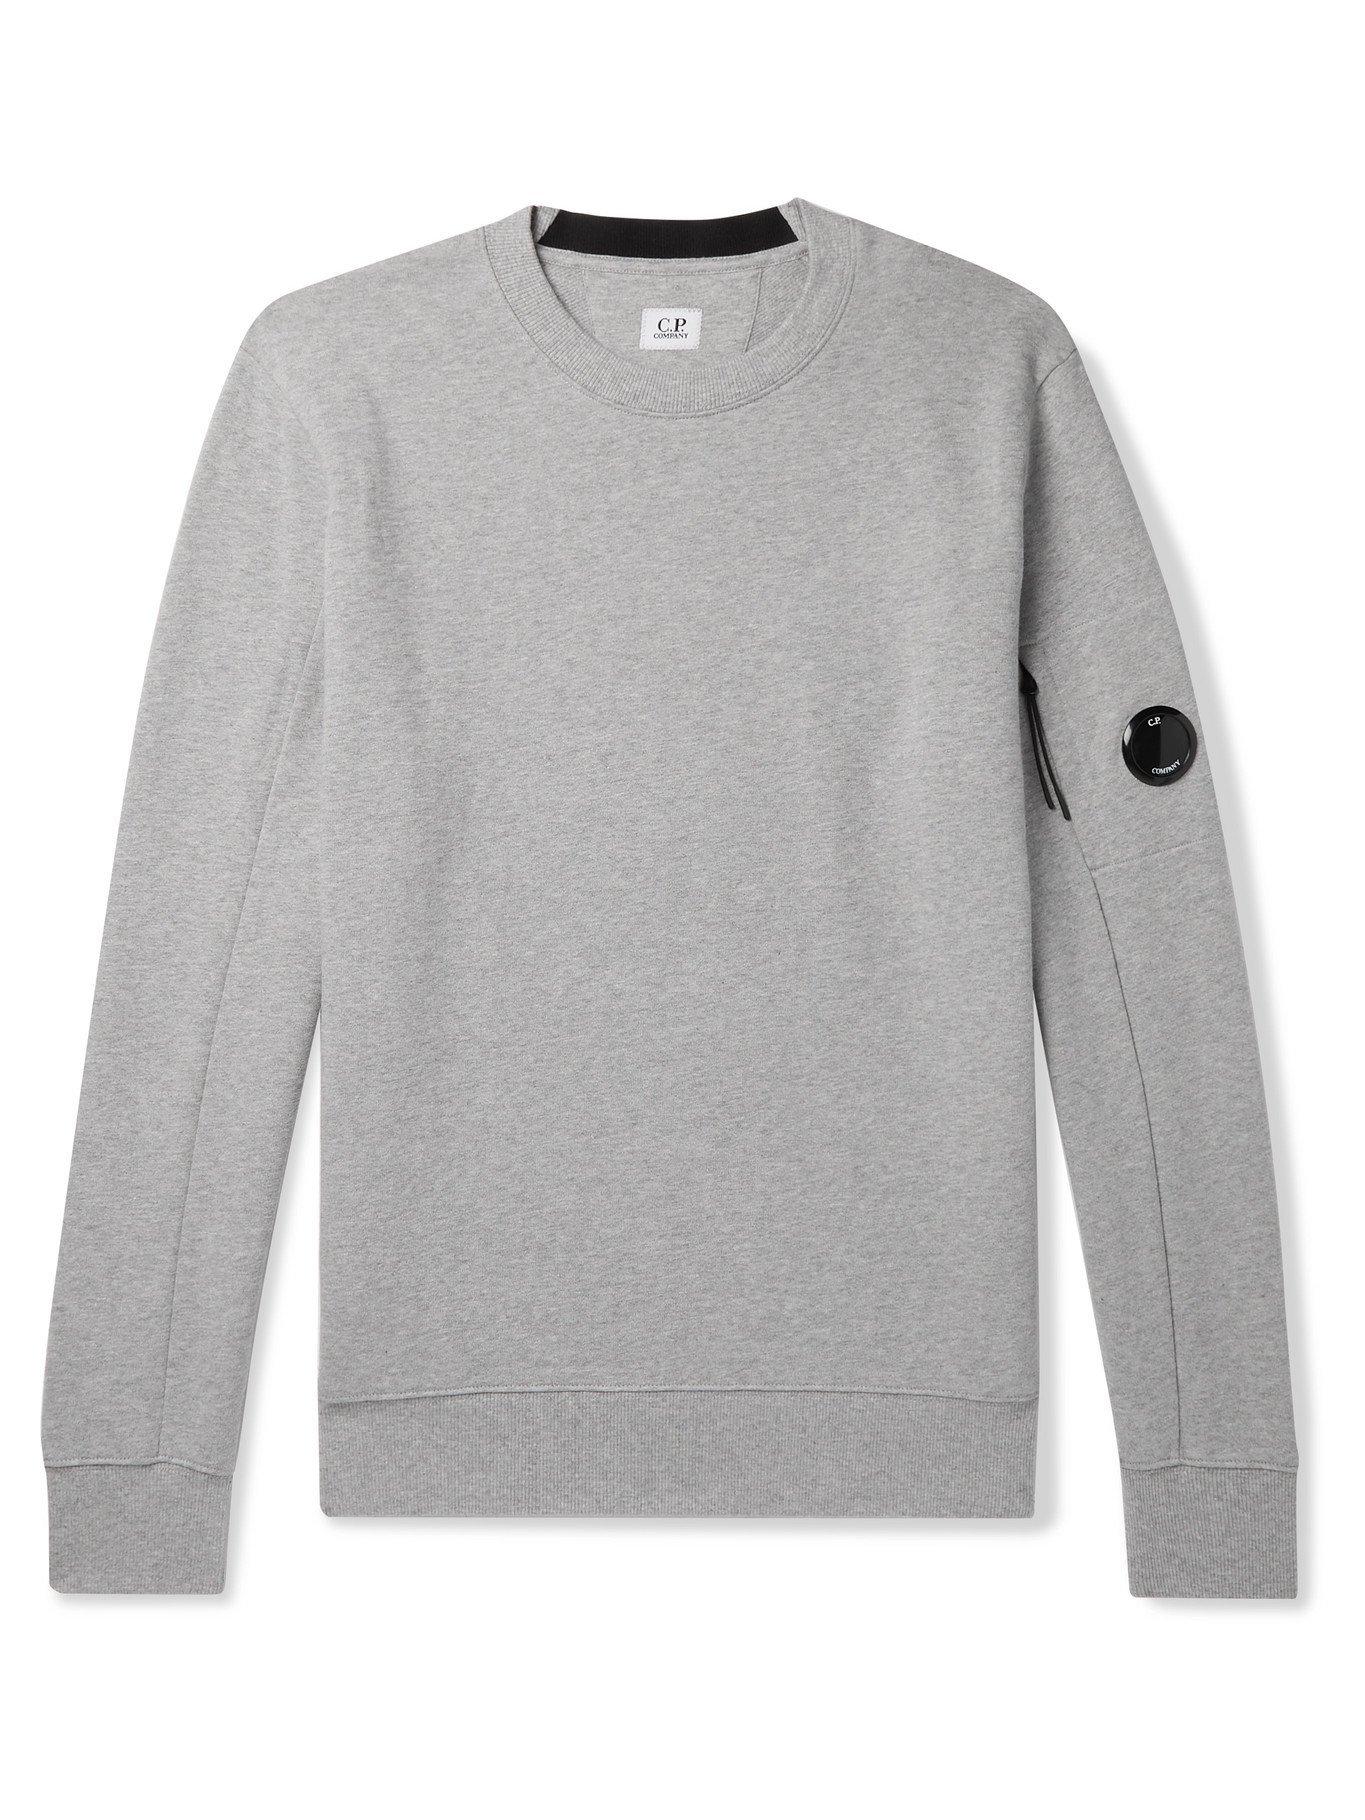 Photo: C.P. COMPANY - Logo-Appliquéd Fleece-Back Cotton-Jersey Sweatshirt - Gray